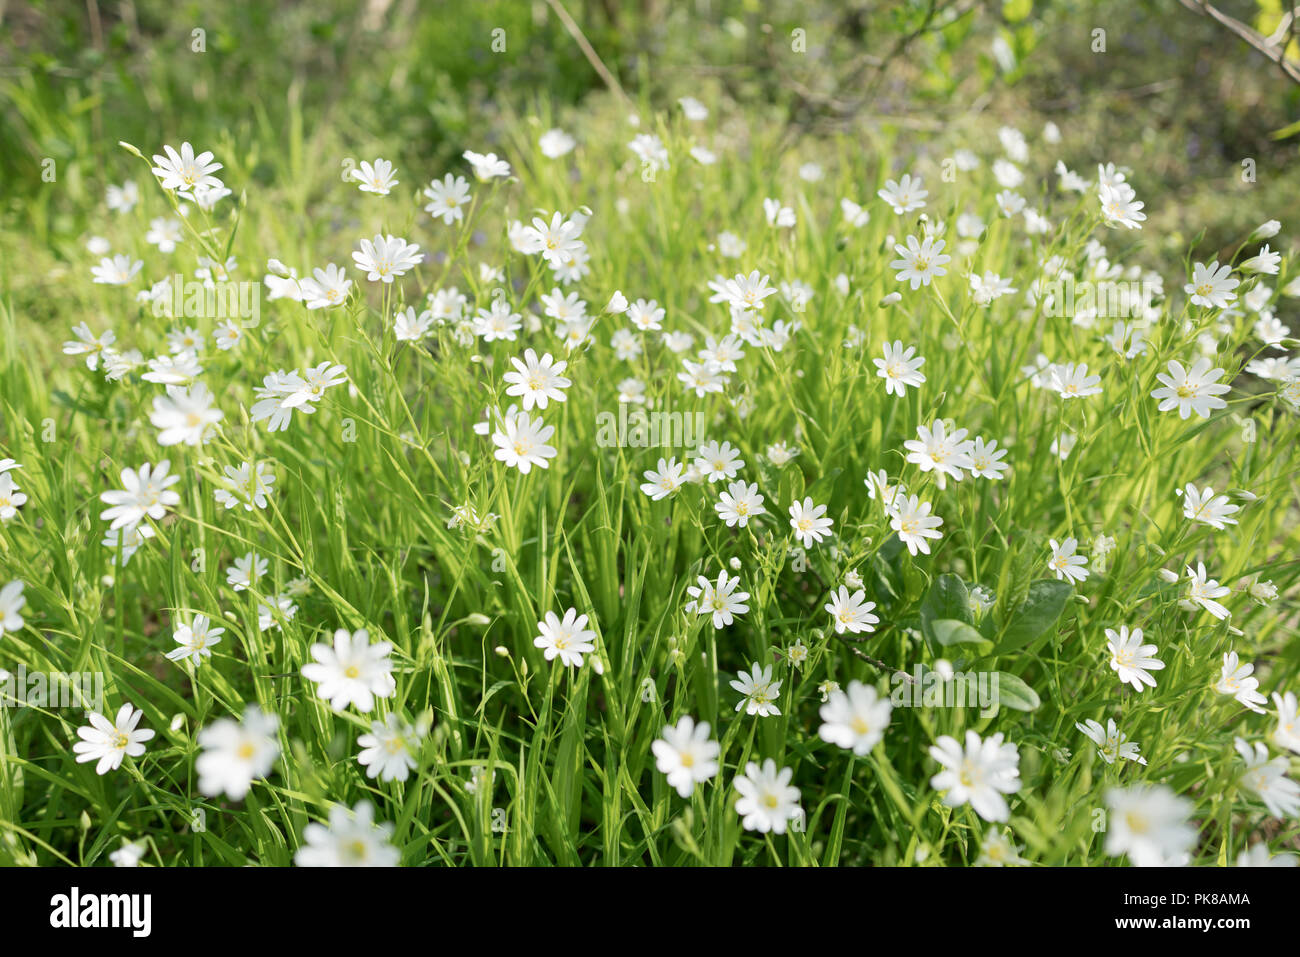 Stellaria Dichotoma Small White Flowers On Grass Stock Photo